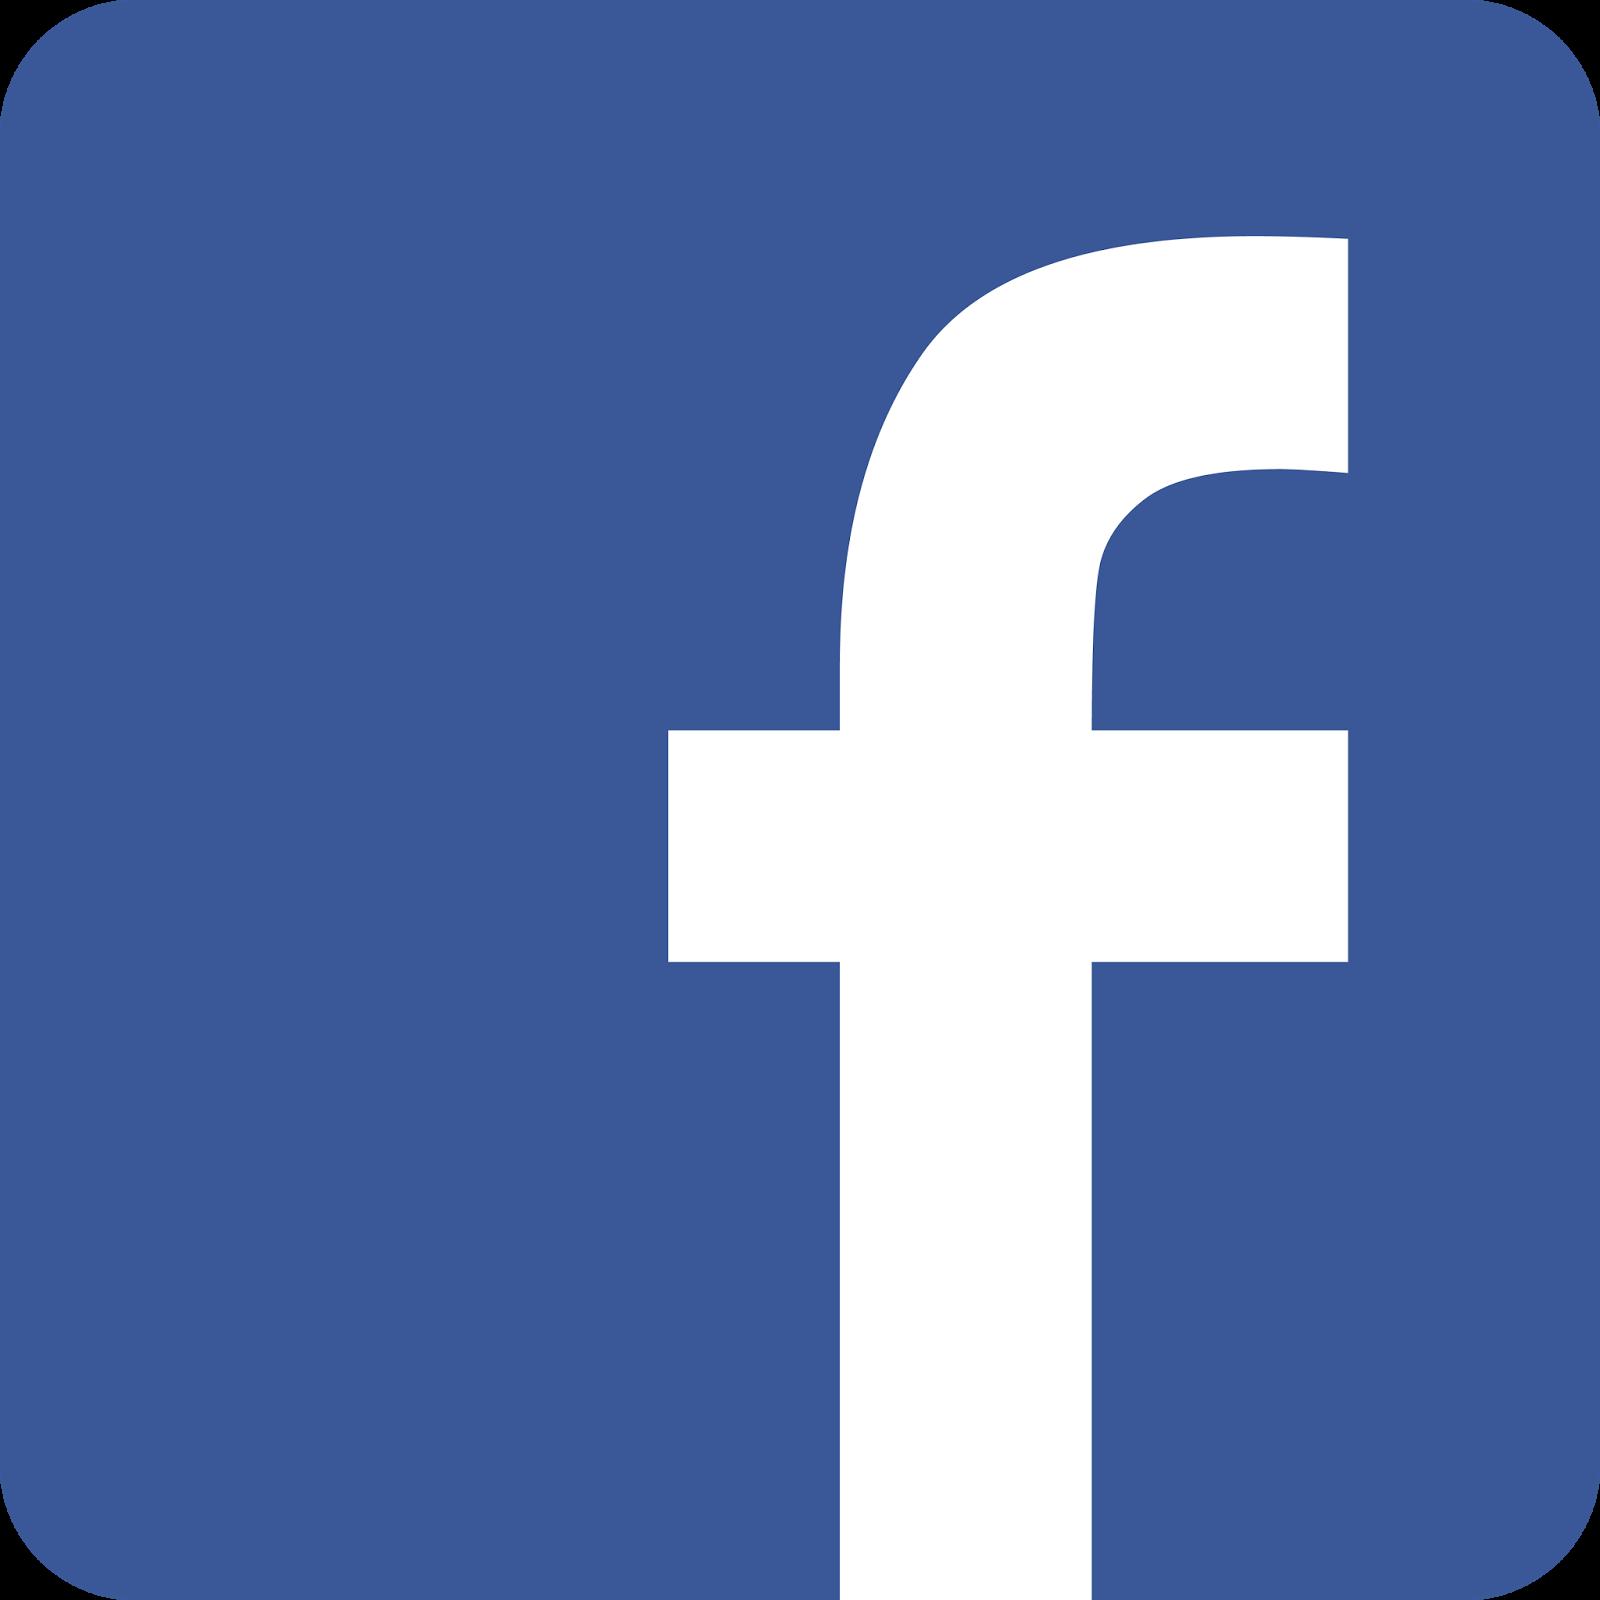 facebook-transparent-logo-png-0